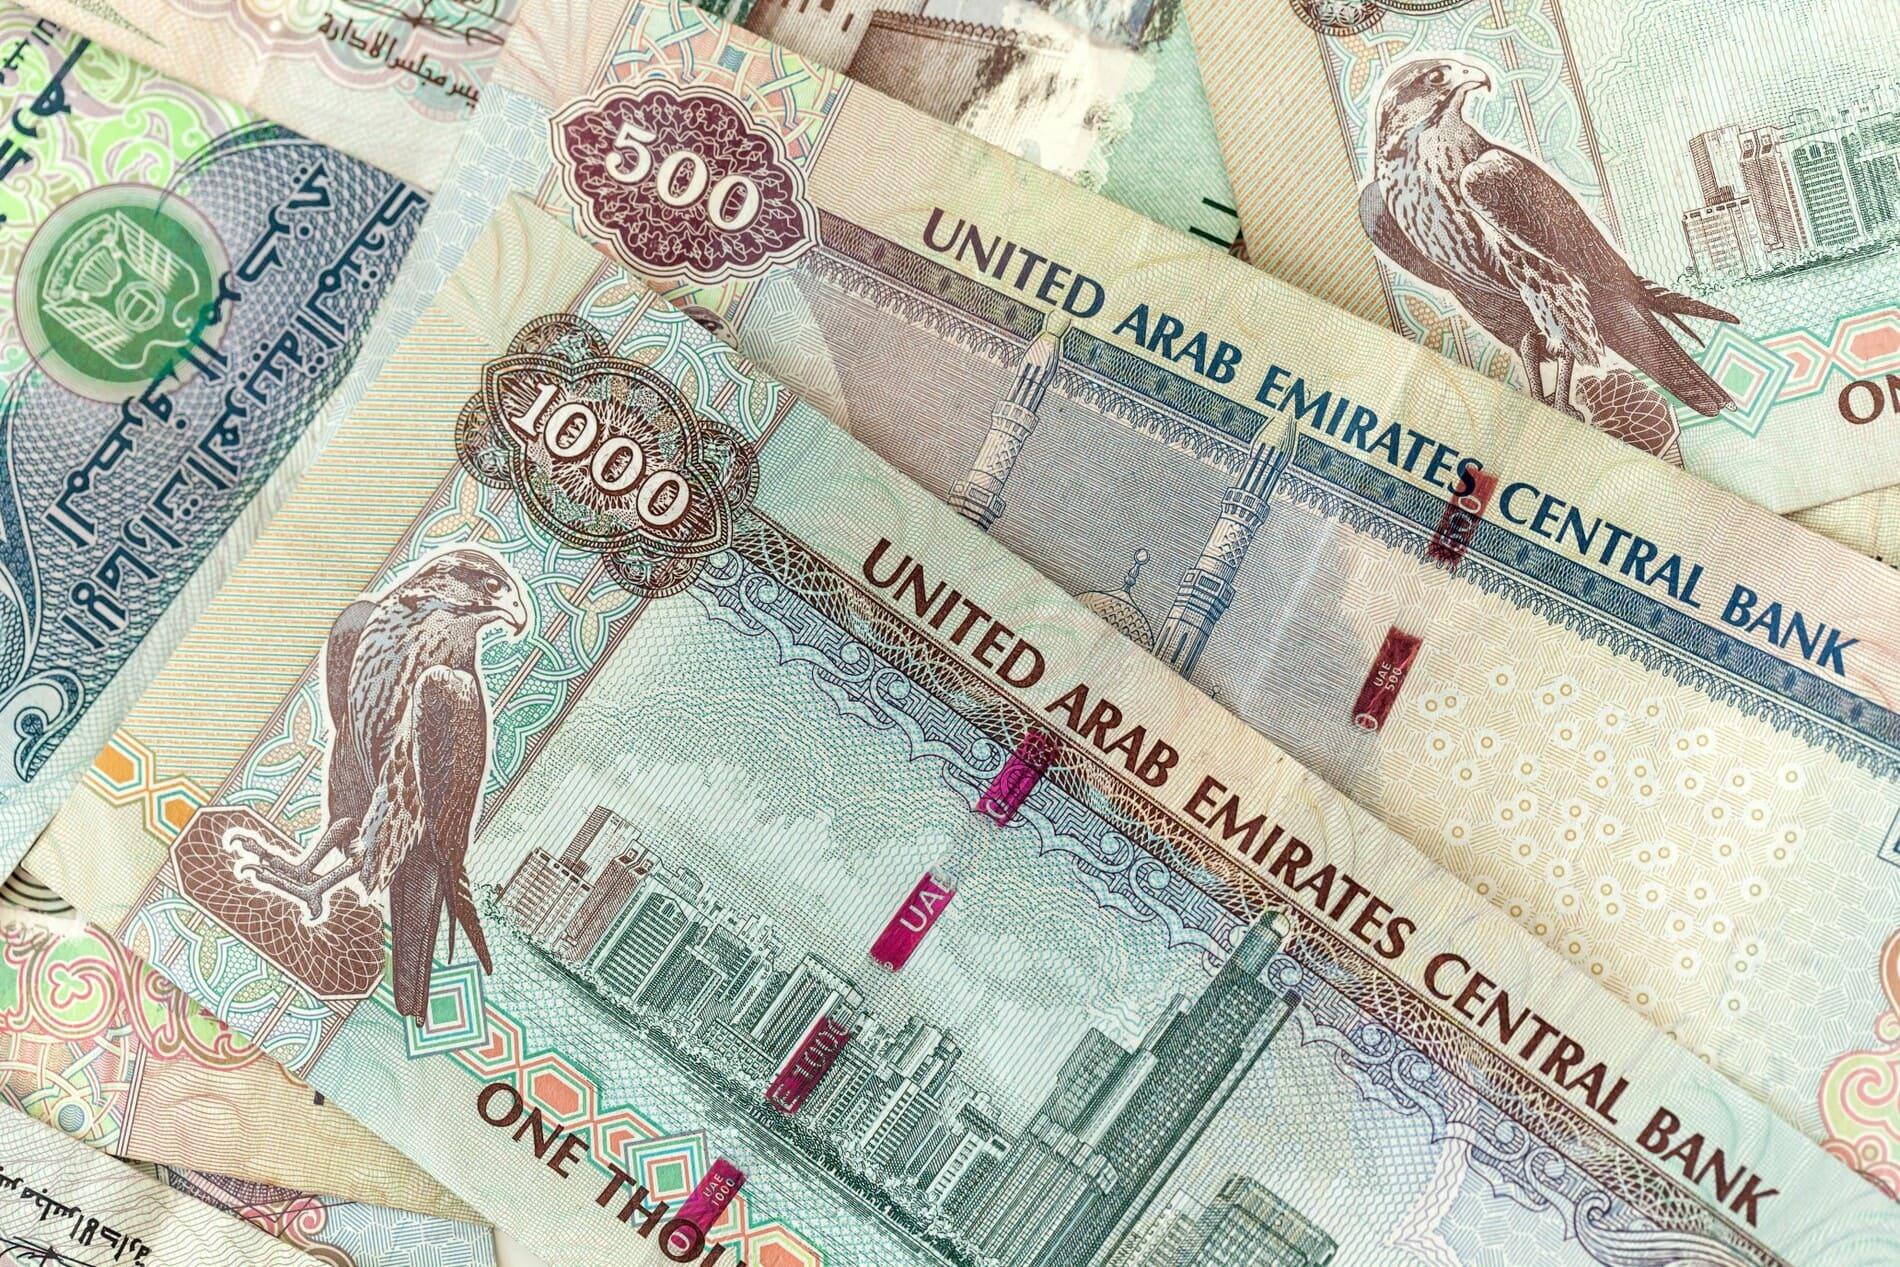 UAE Currency Museum